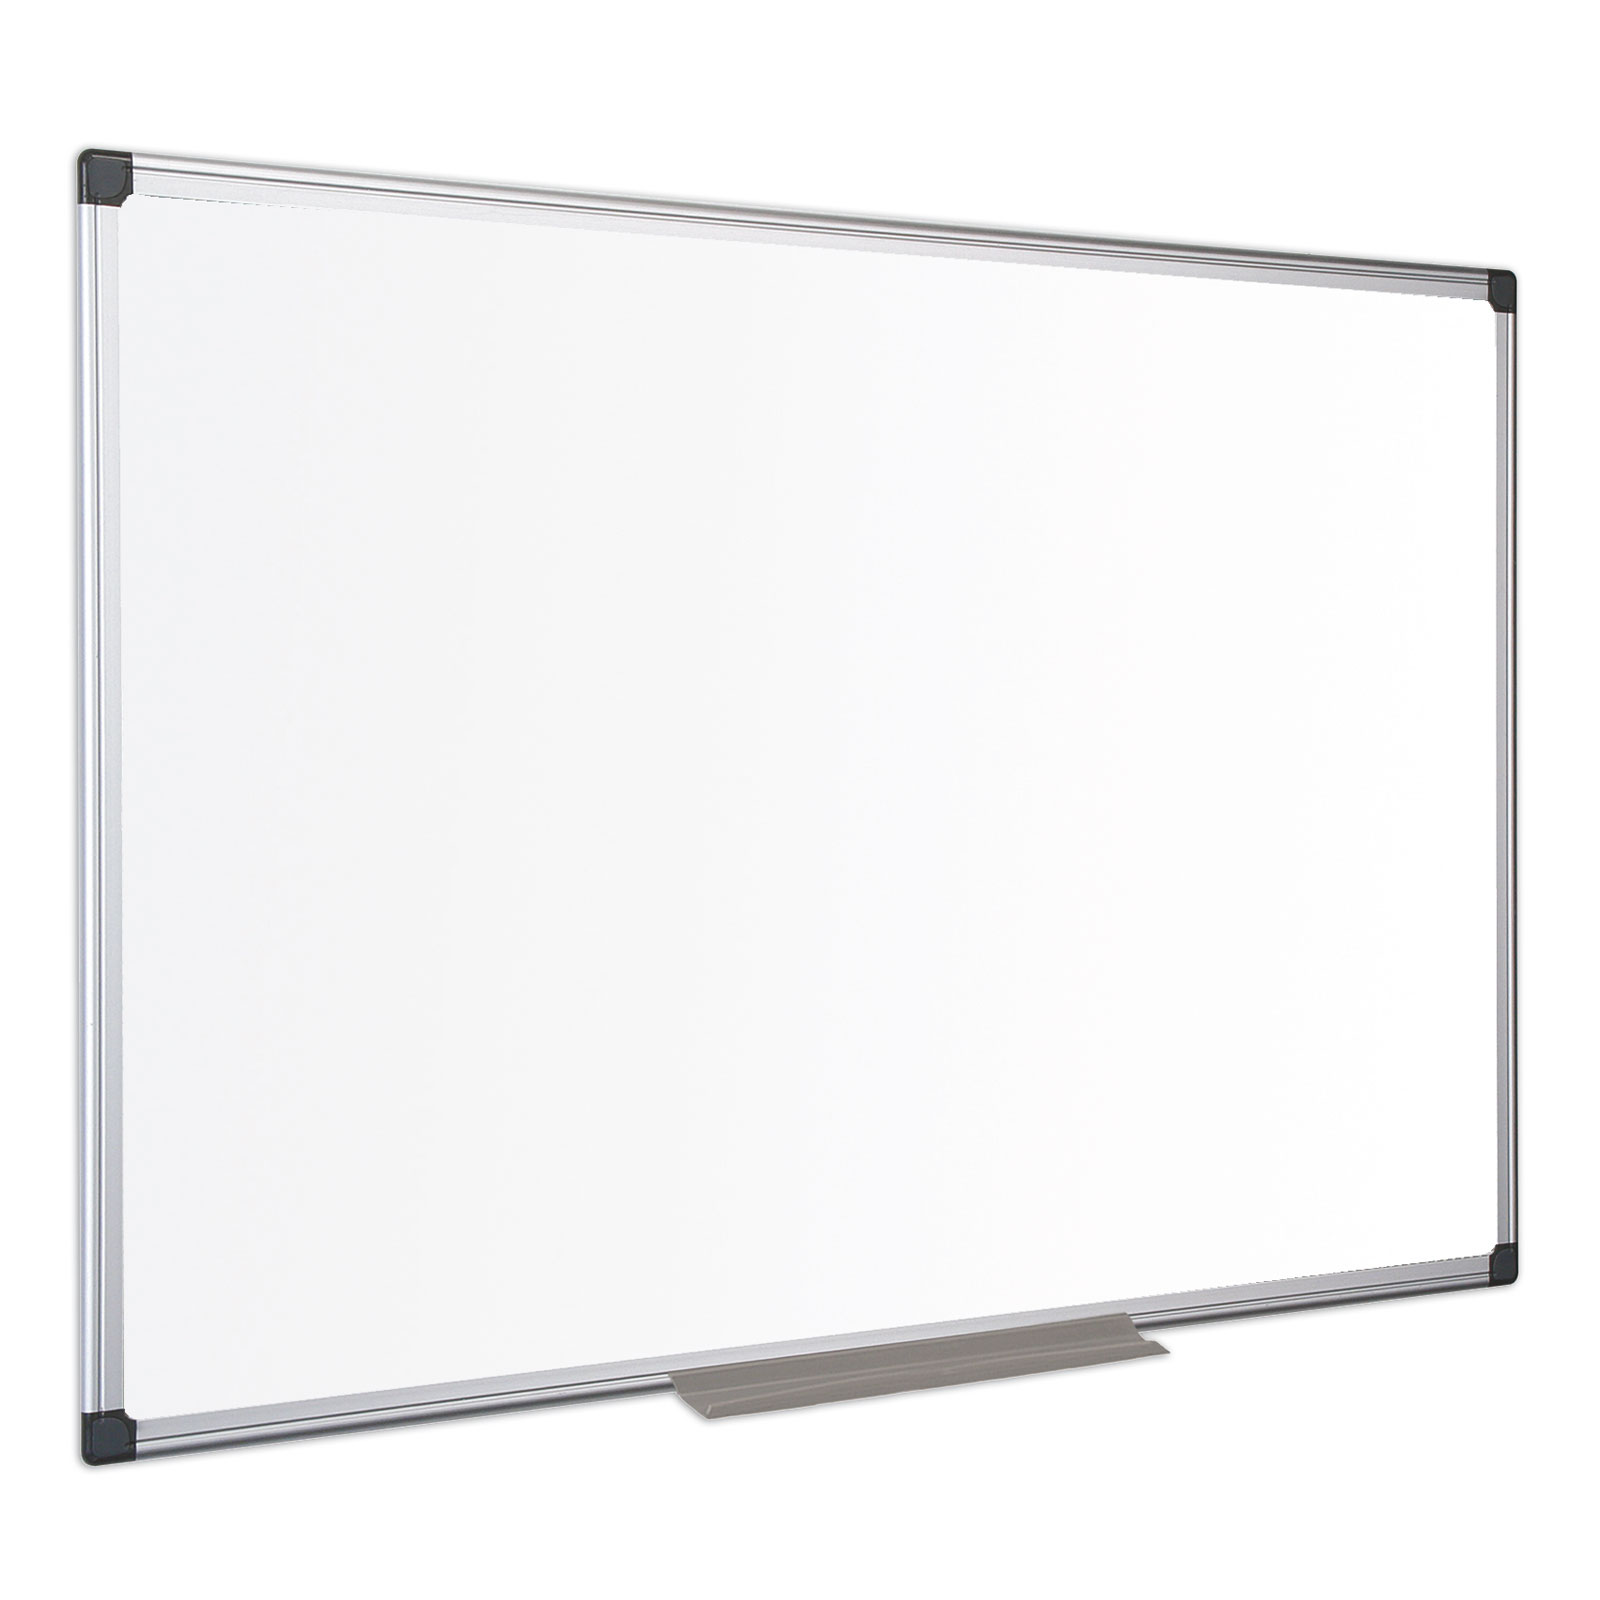 bi office tableau blanc laqu 90 x 60 cm tableau blanc et paperboard bi office sur. Black Bedroom Furniture Sets. Home Design Ideas